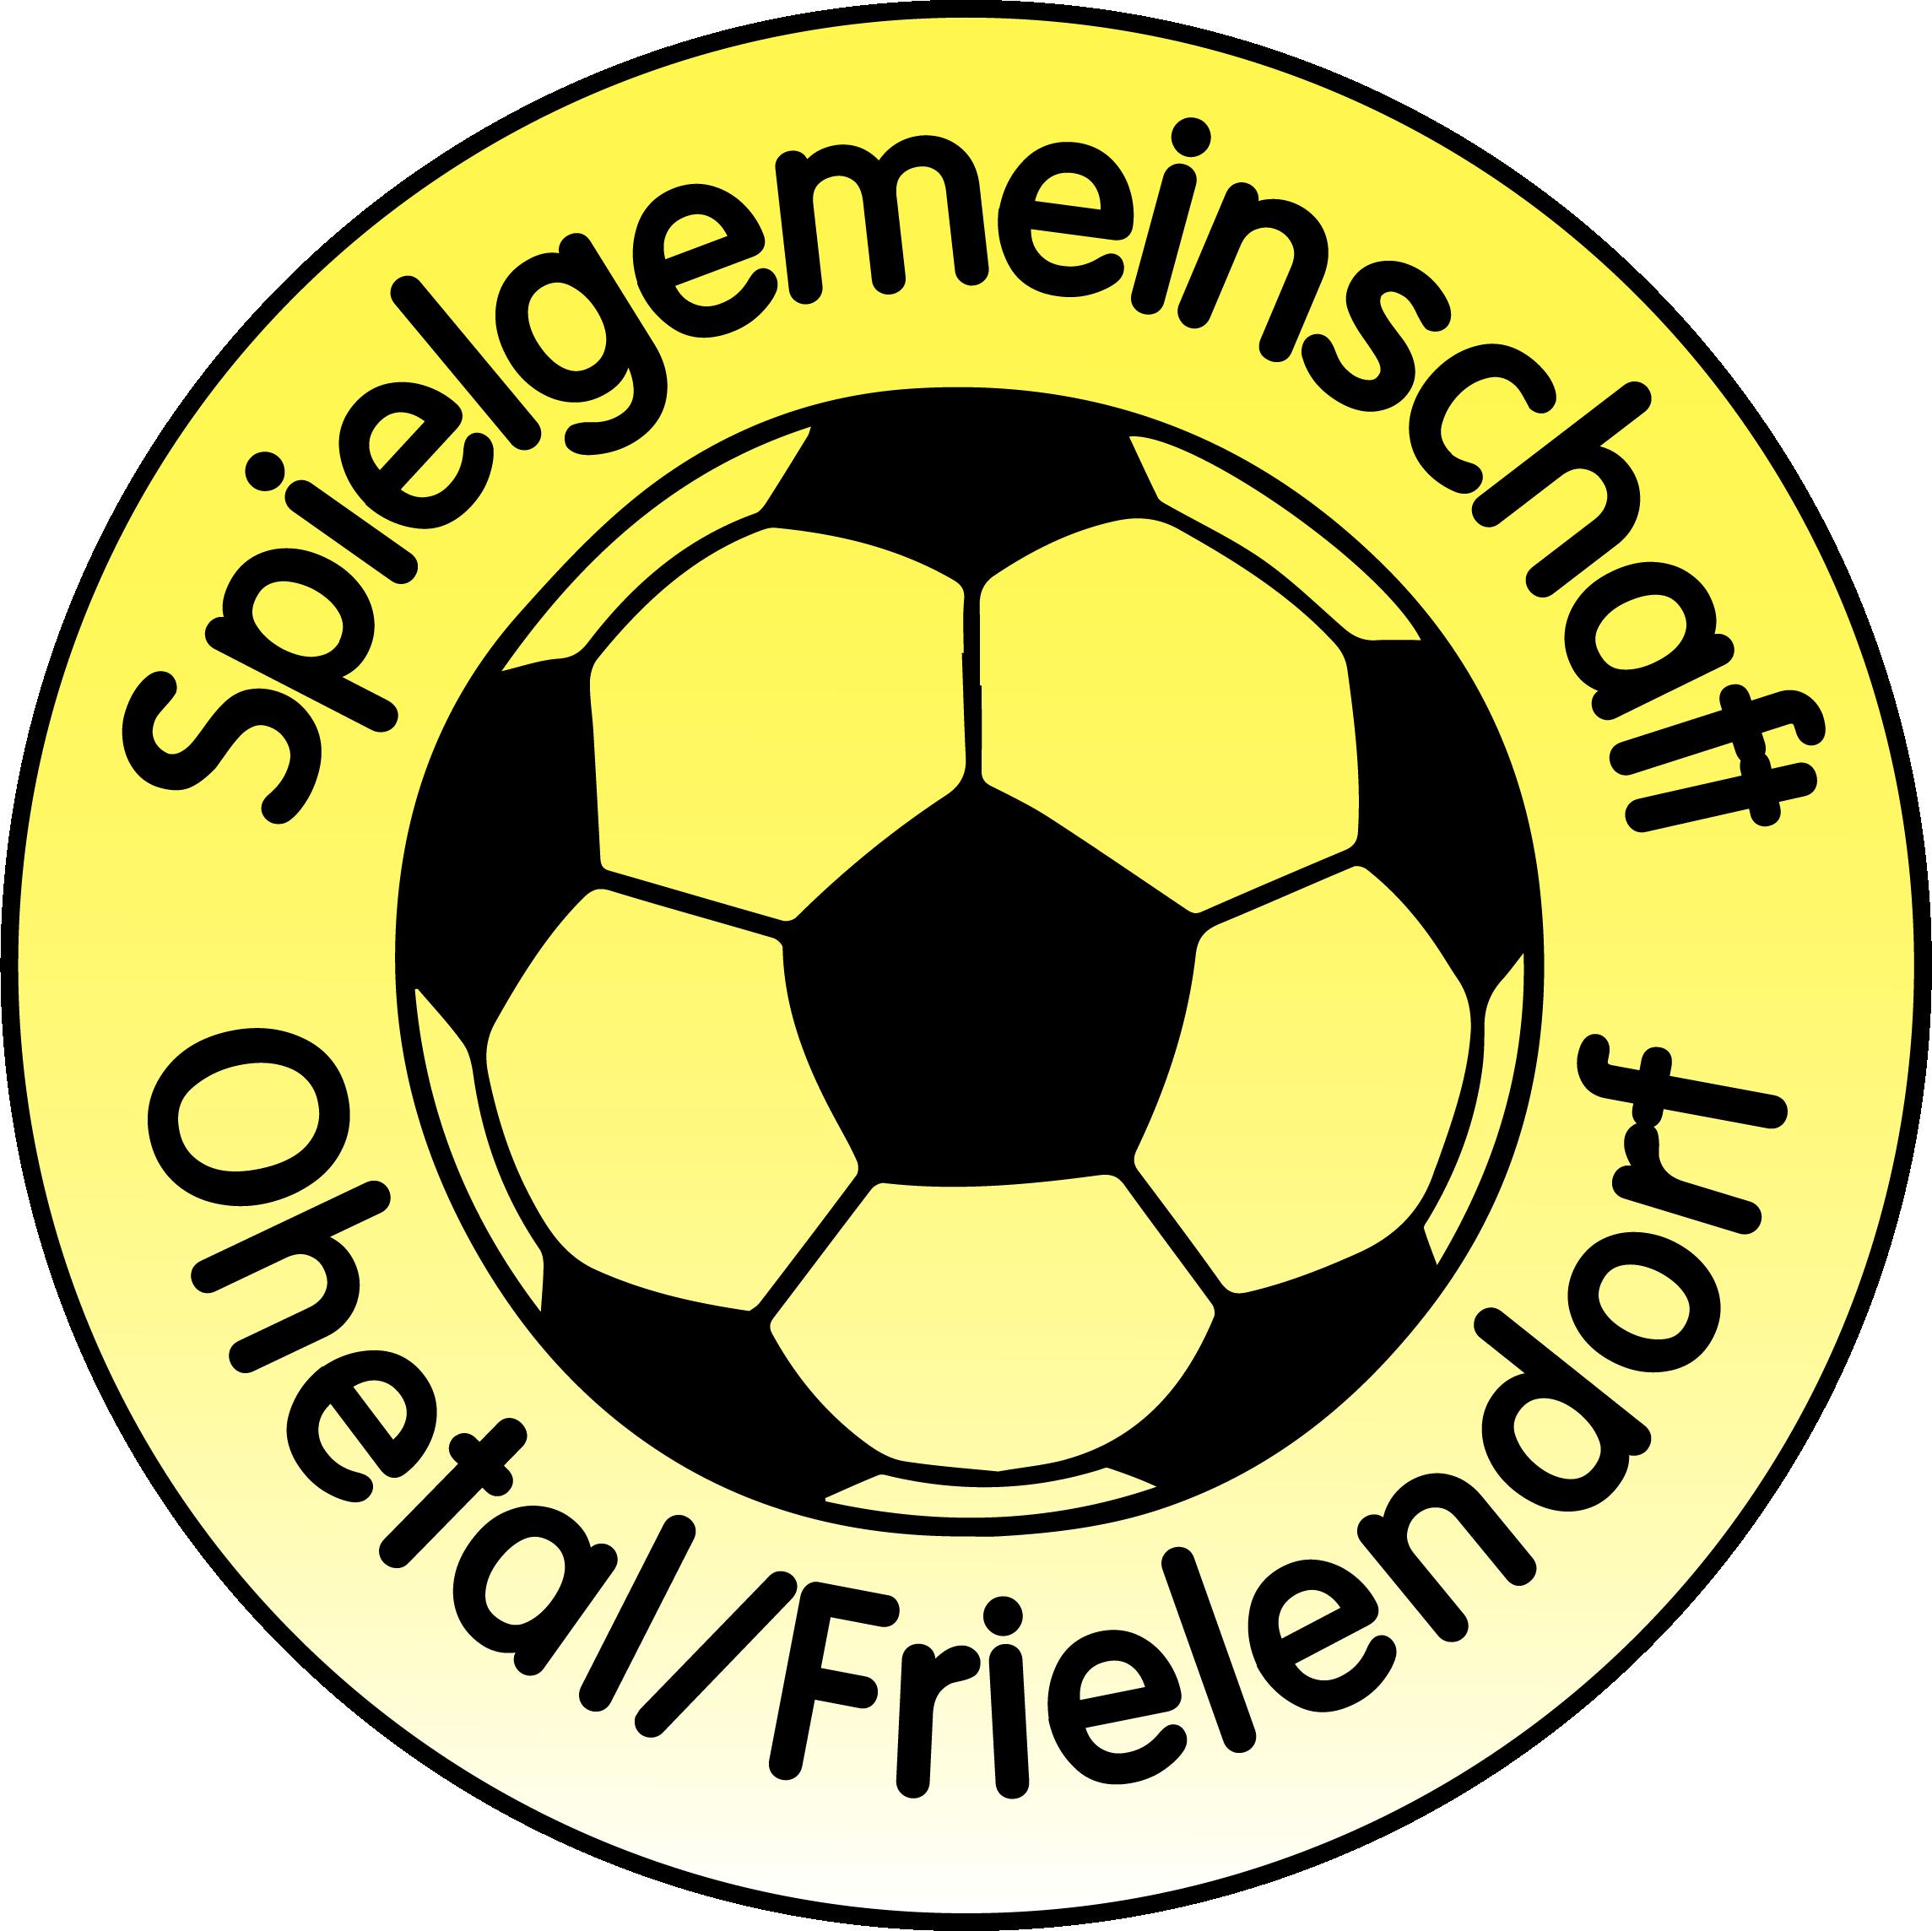 SG Ohetal/Frielendorf